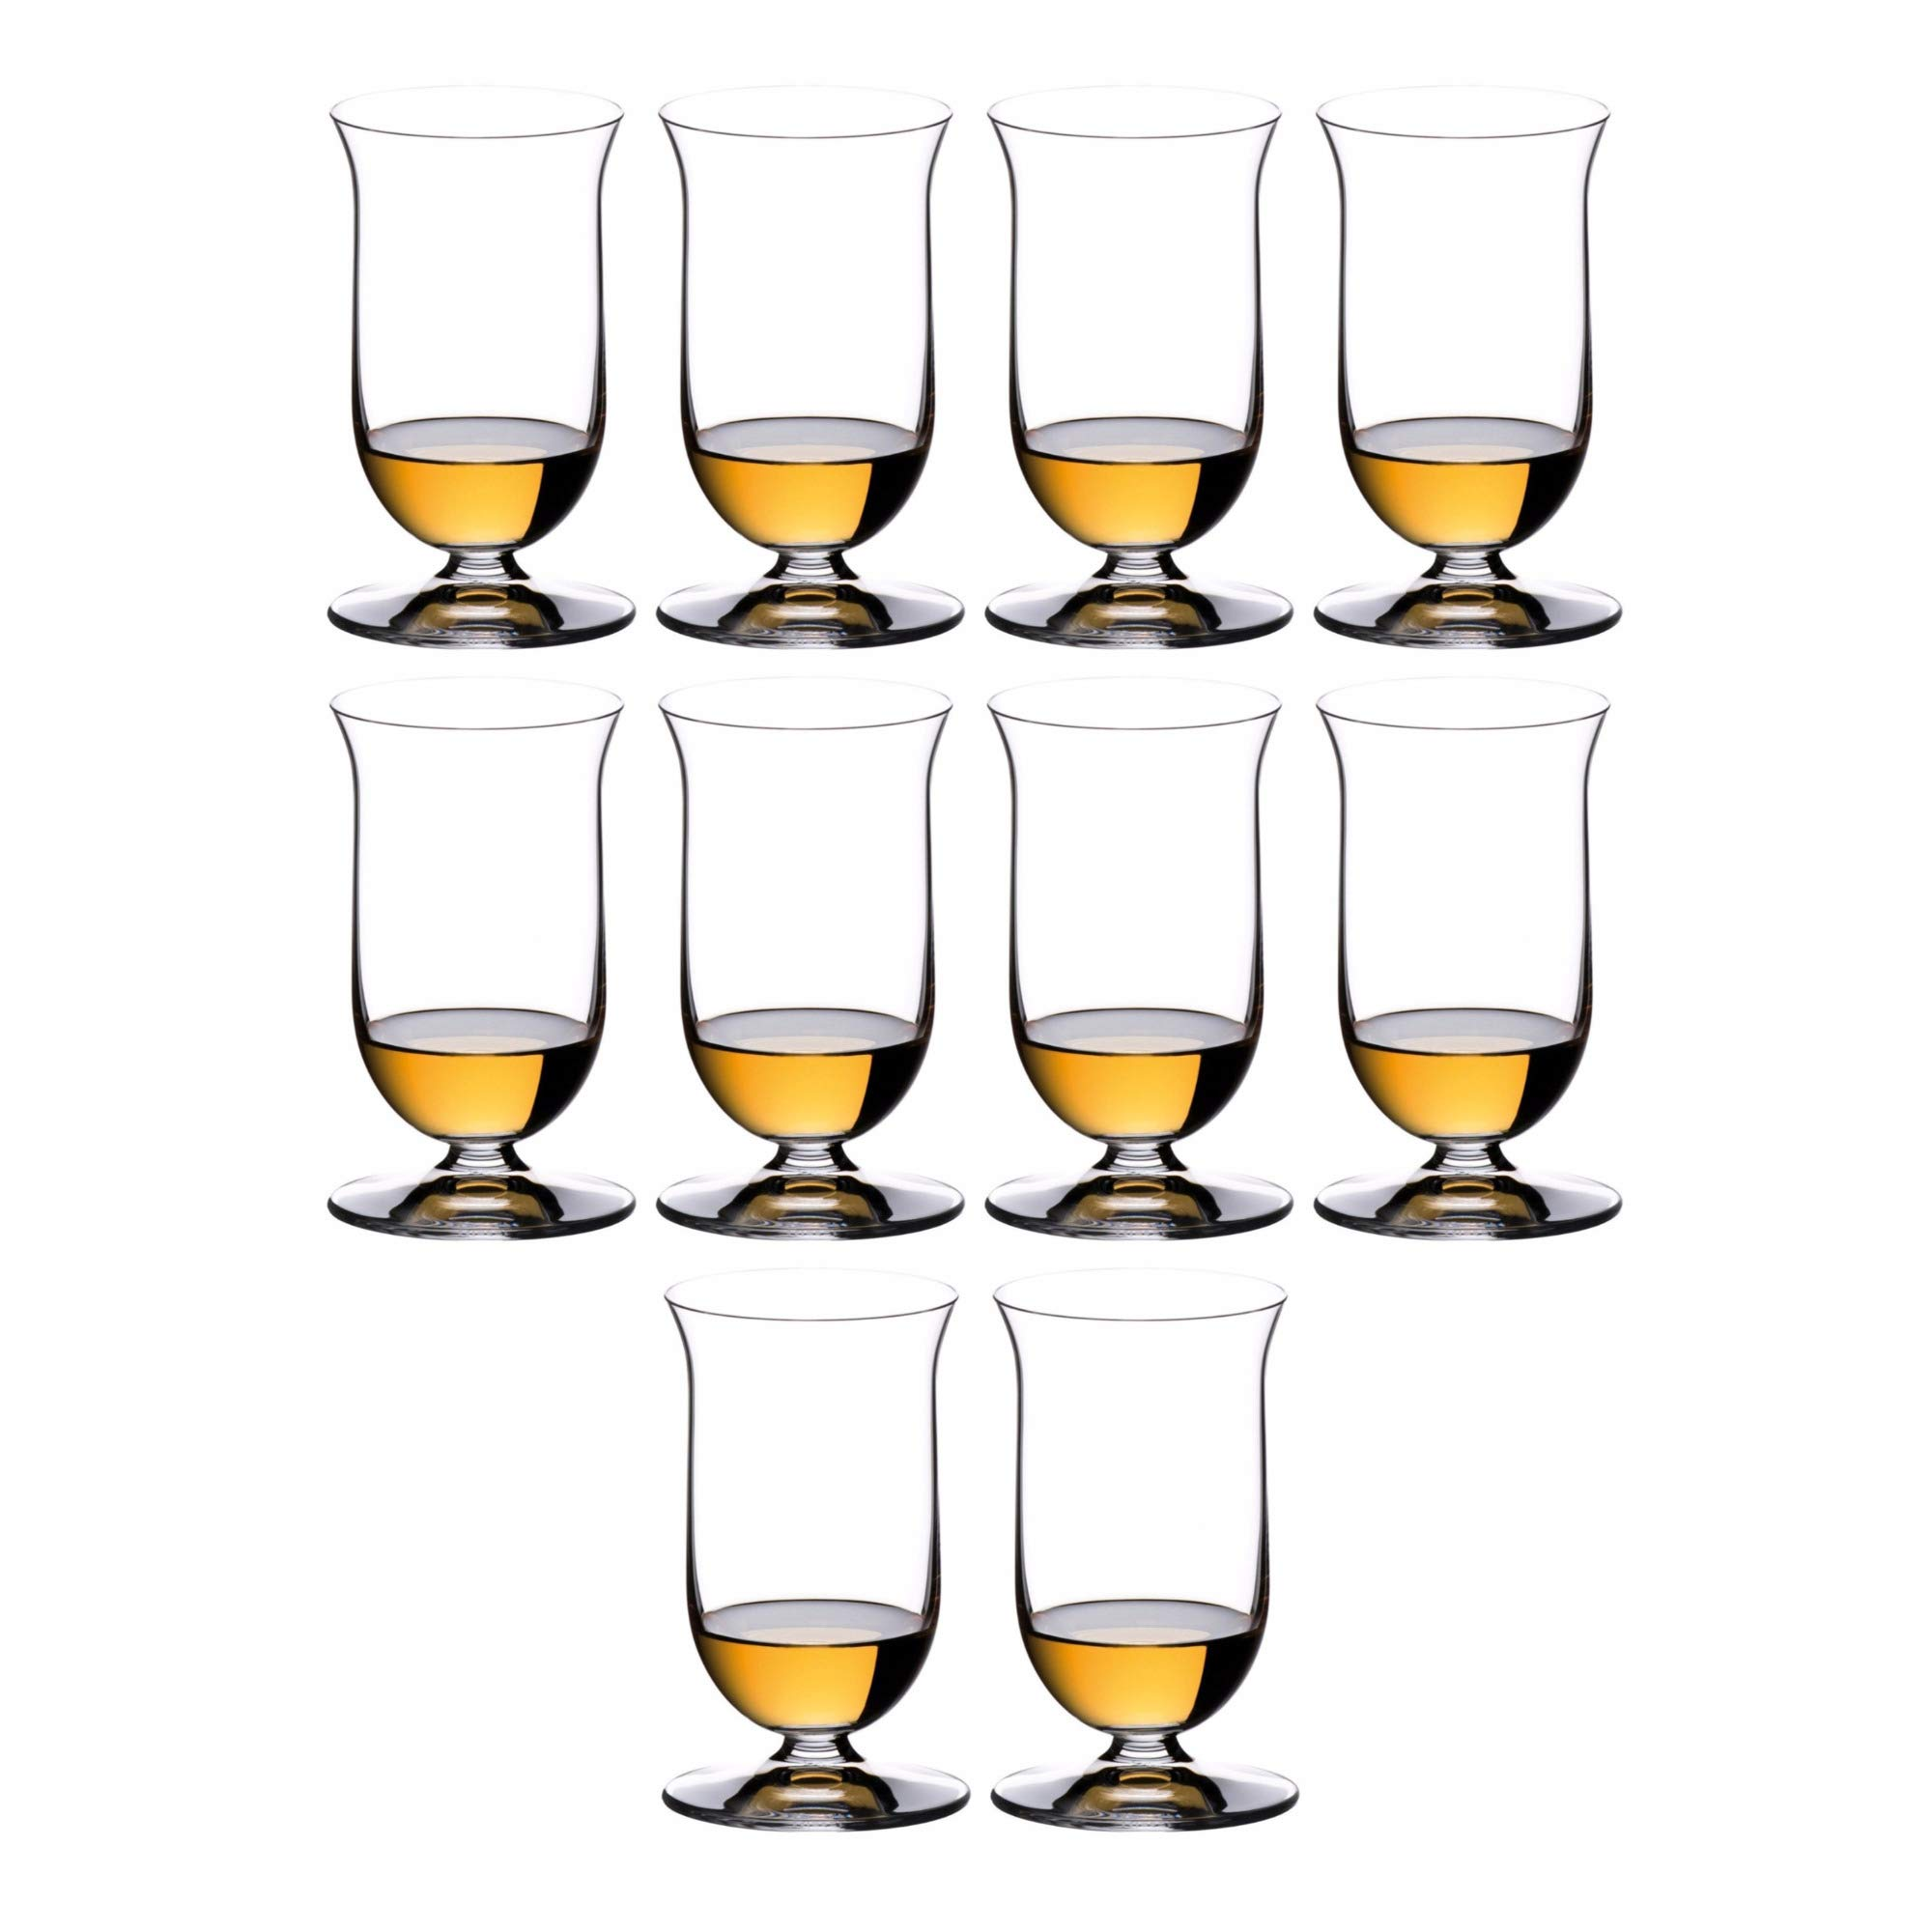 Riedel 6416/80 VINUM Whisky Glass, Set of 10